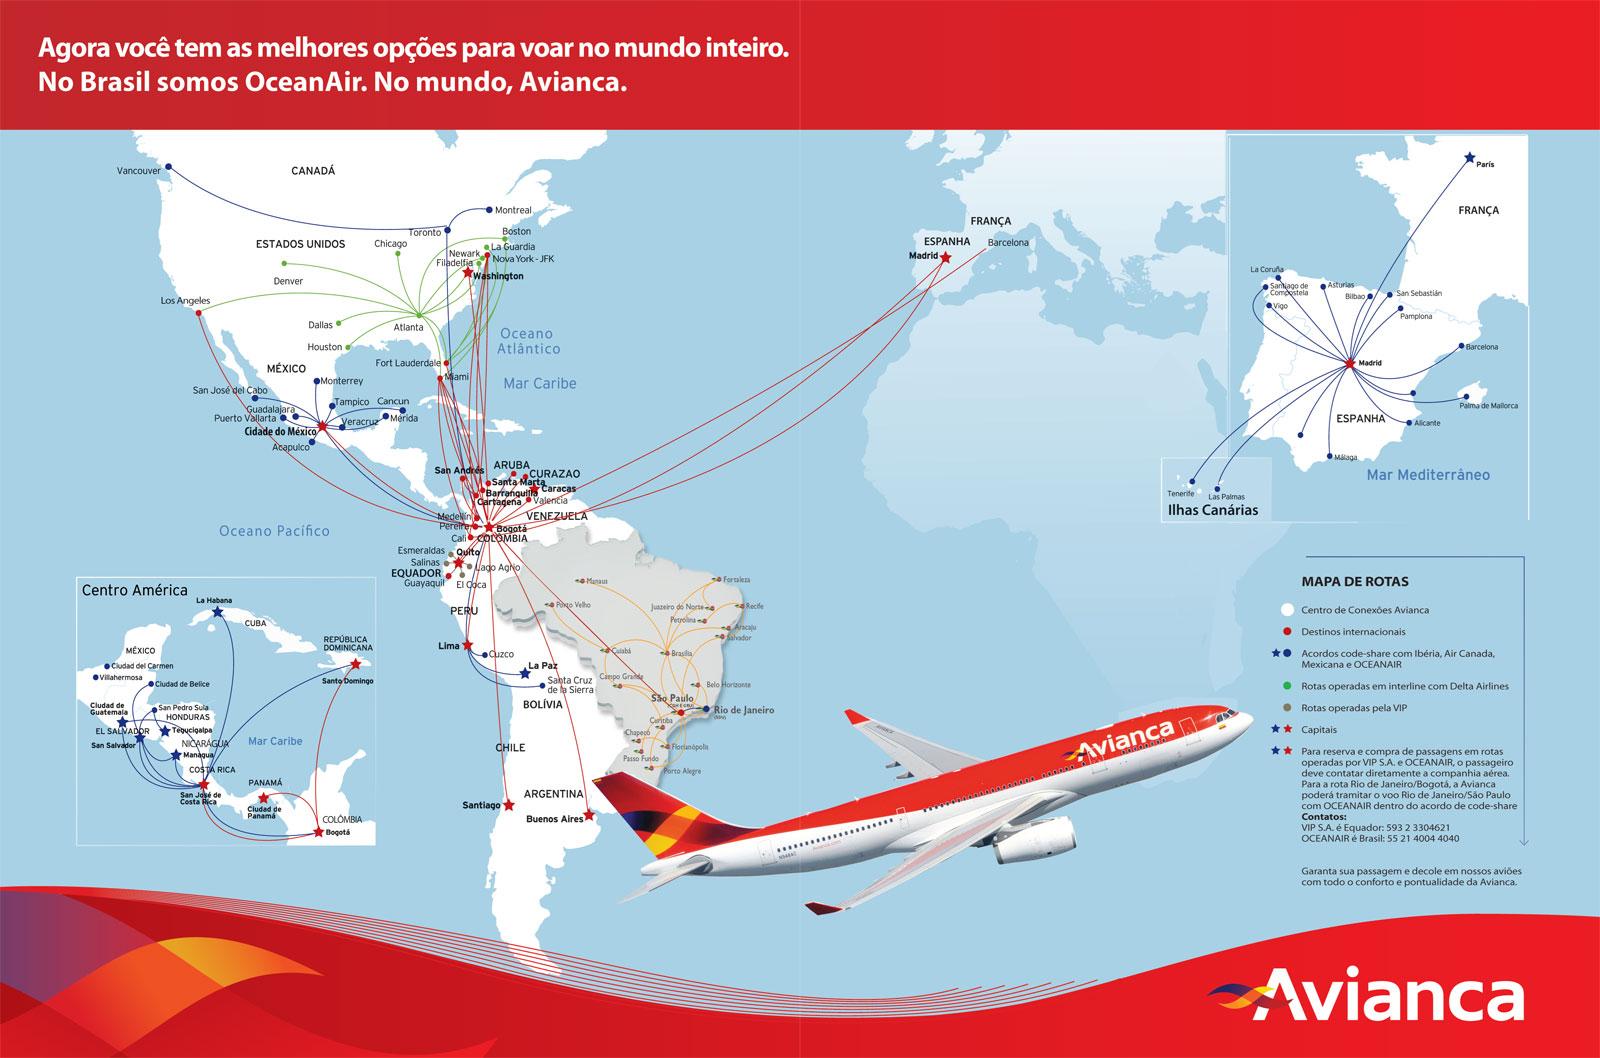 linea aereas vuelos destino: